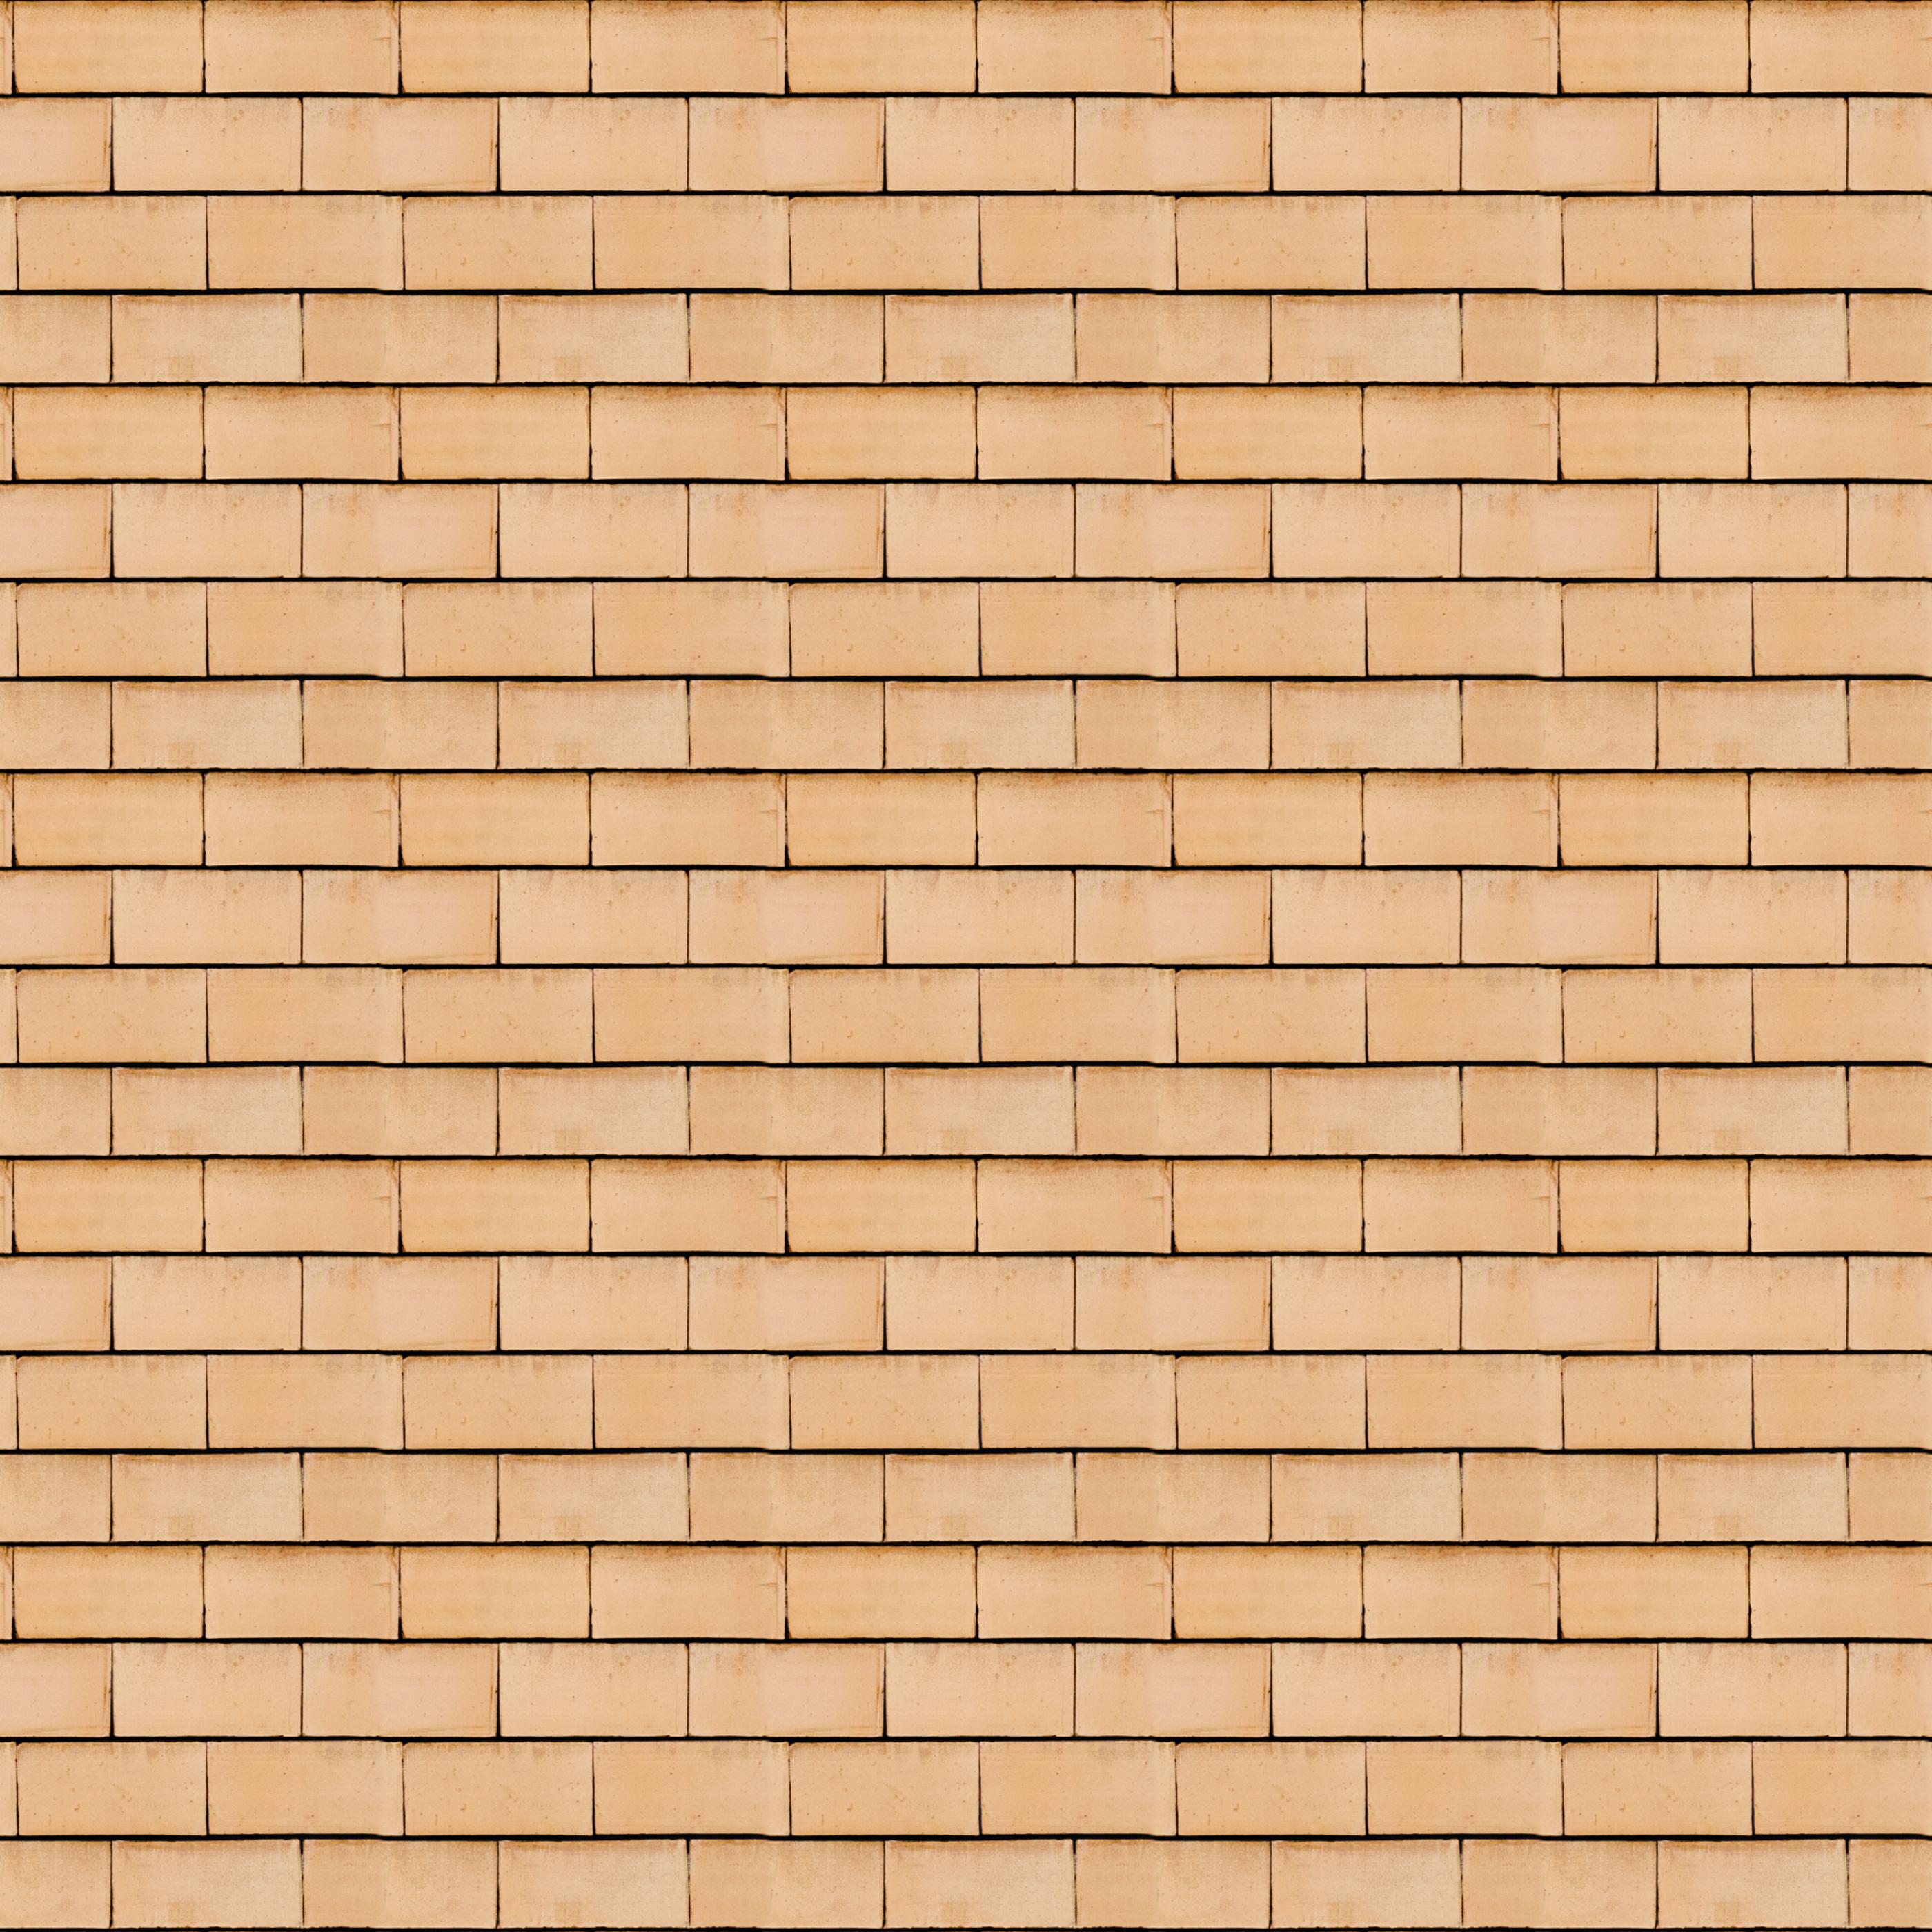 Seamless Brick Wall Texture Pattern